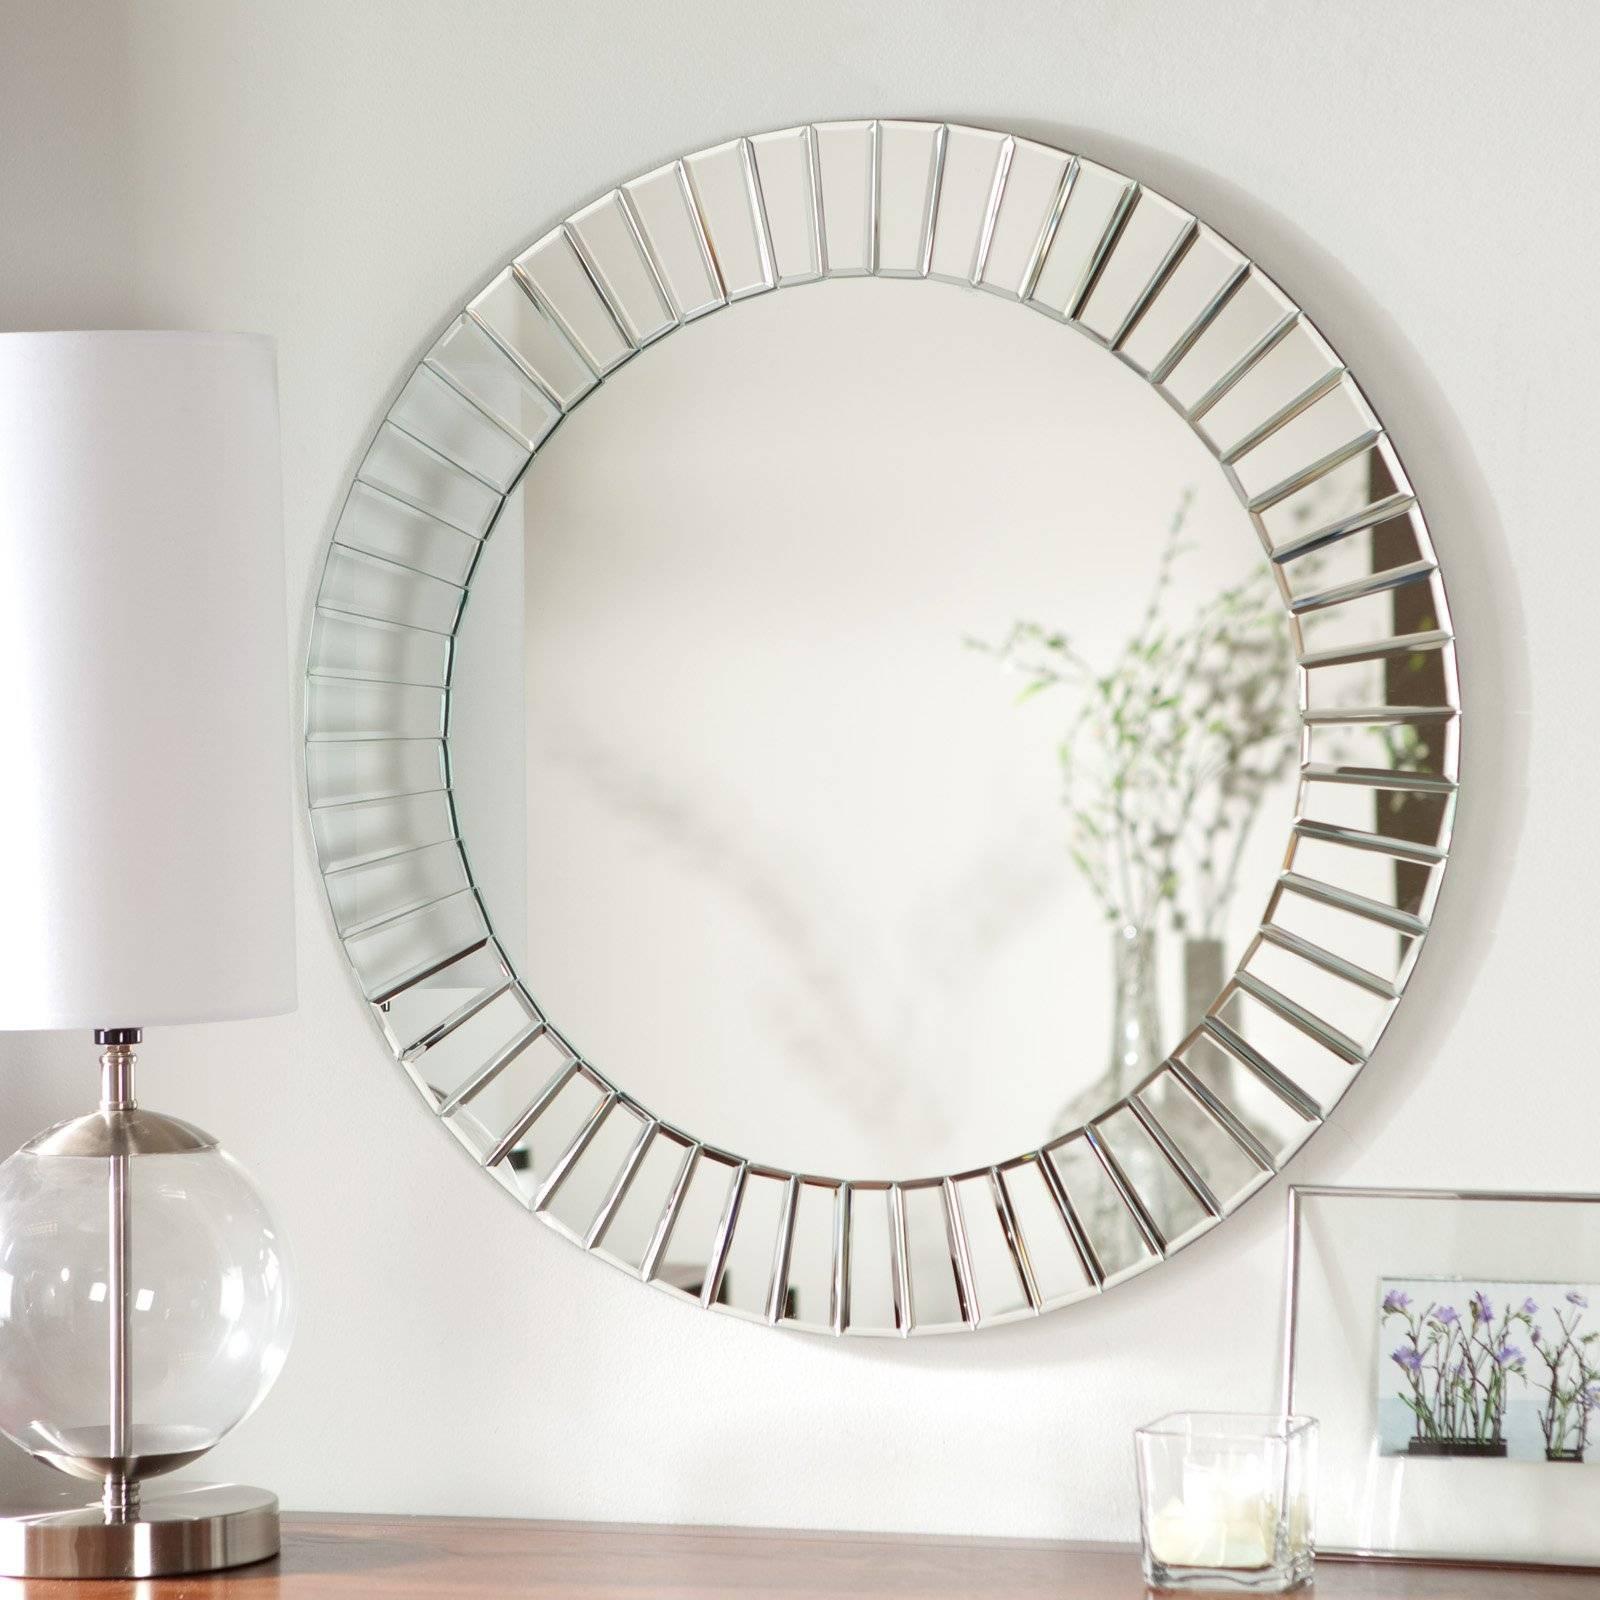 Décor Wonderland Fortune Modern Frameless Beveled Wall Mirror regarding Frameless Wall Mirrors (Image 4 of 15)